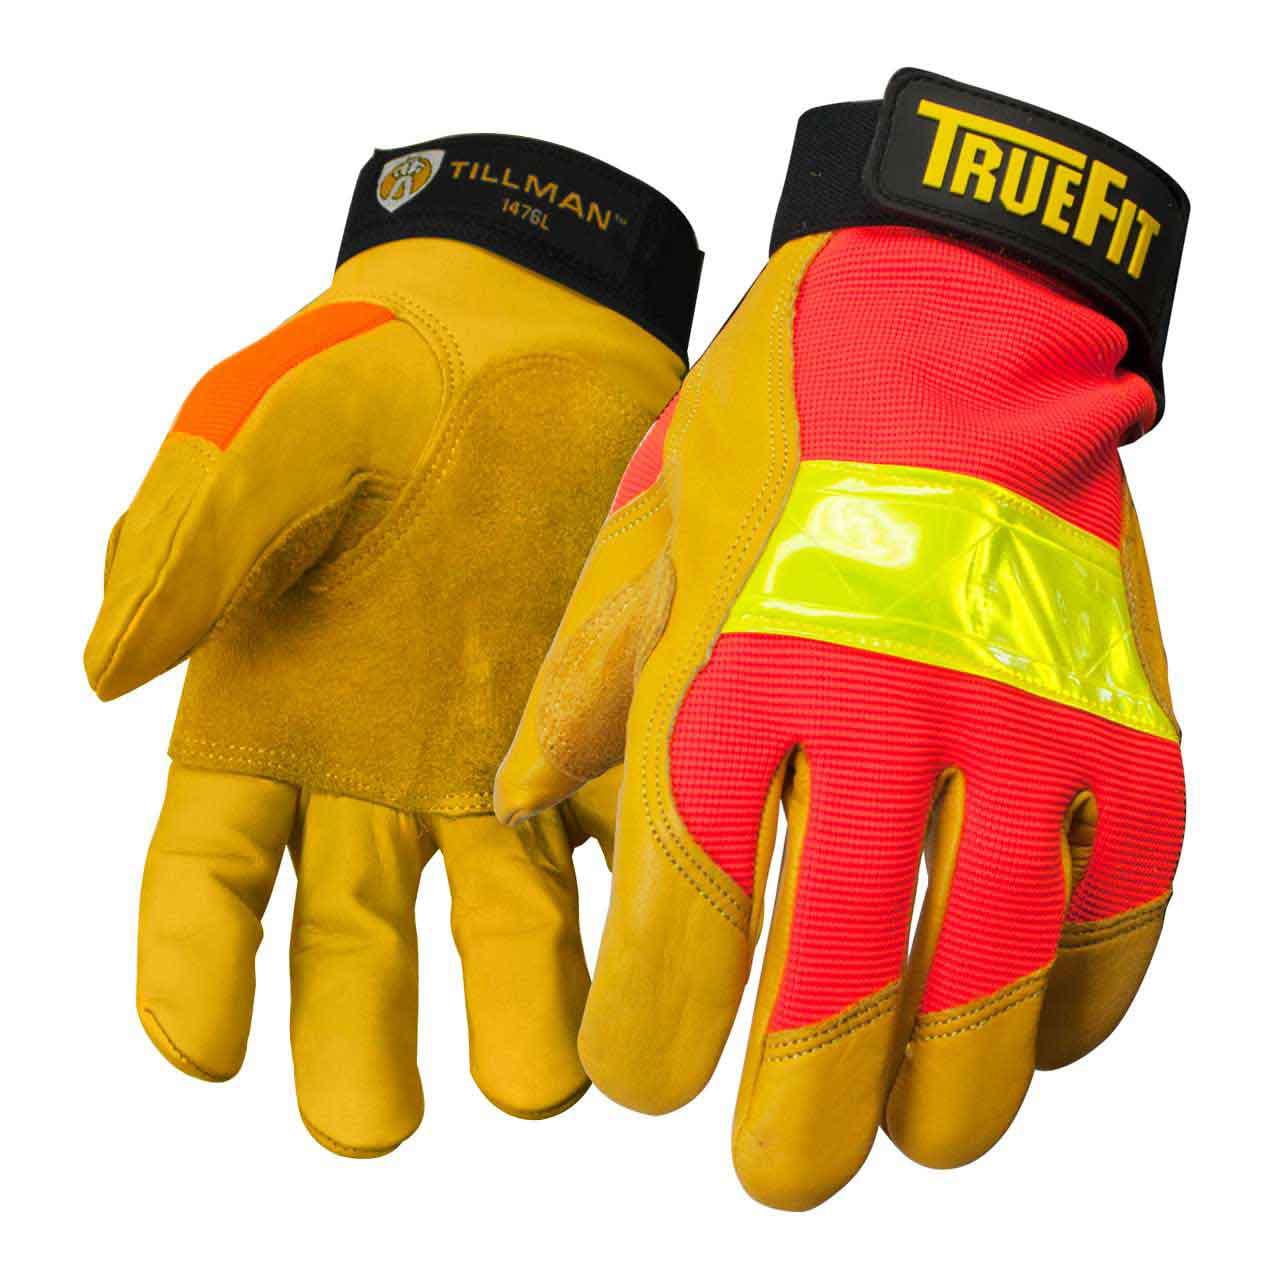 Tillman 1476 True Fit Hi-Vis Top Grain Cowhide Performance Work Gloves, Medium